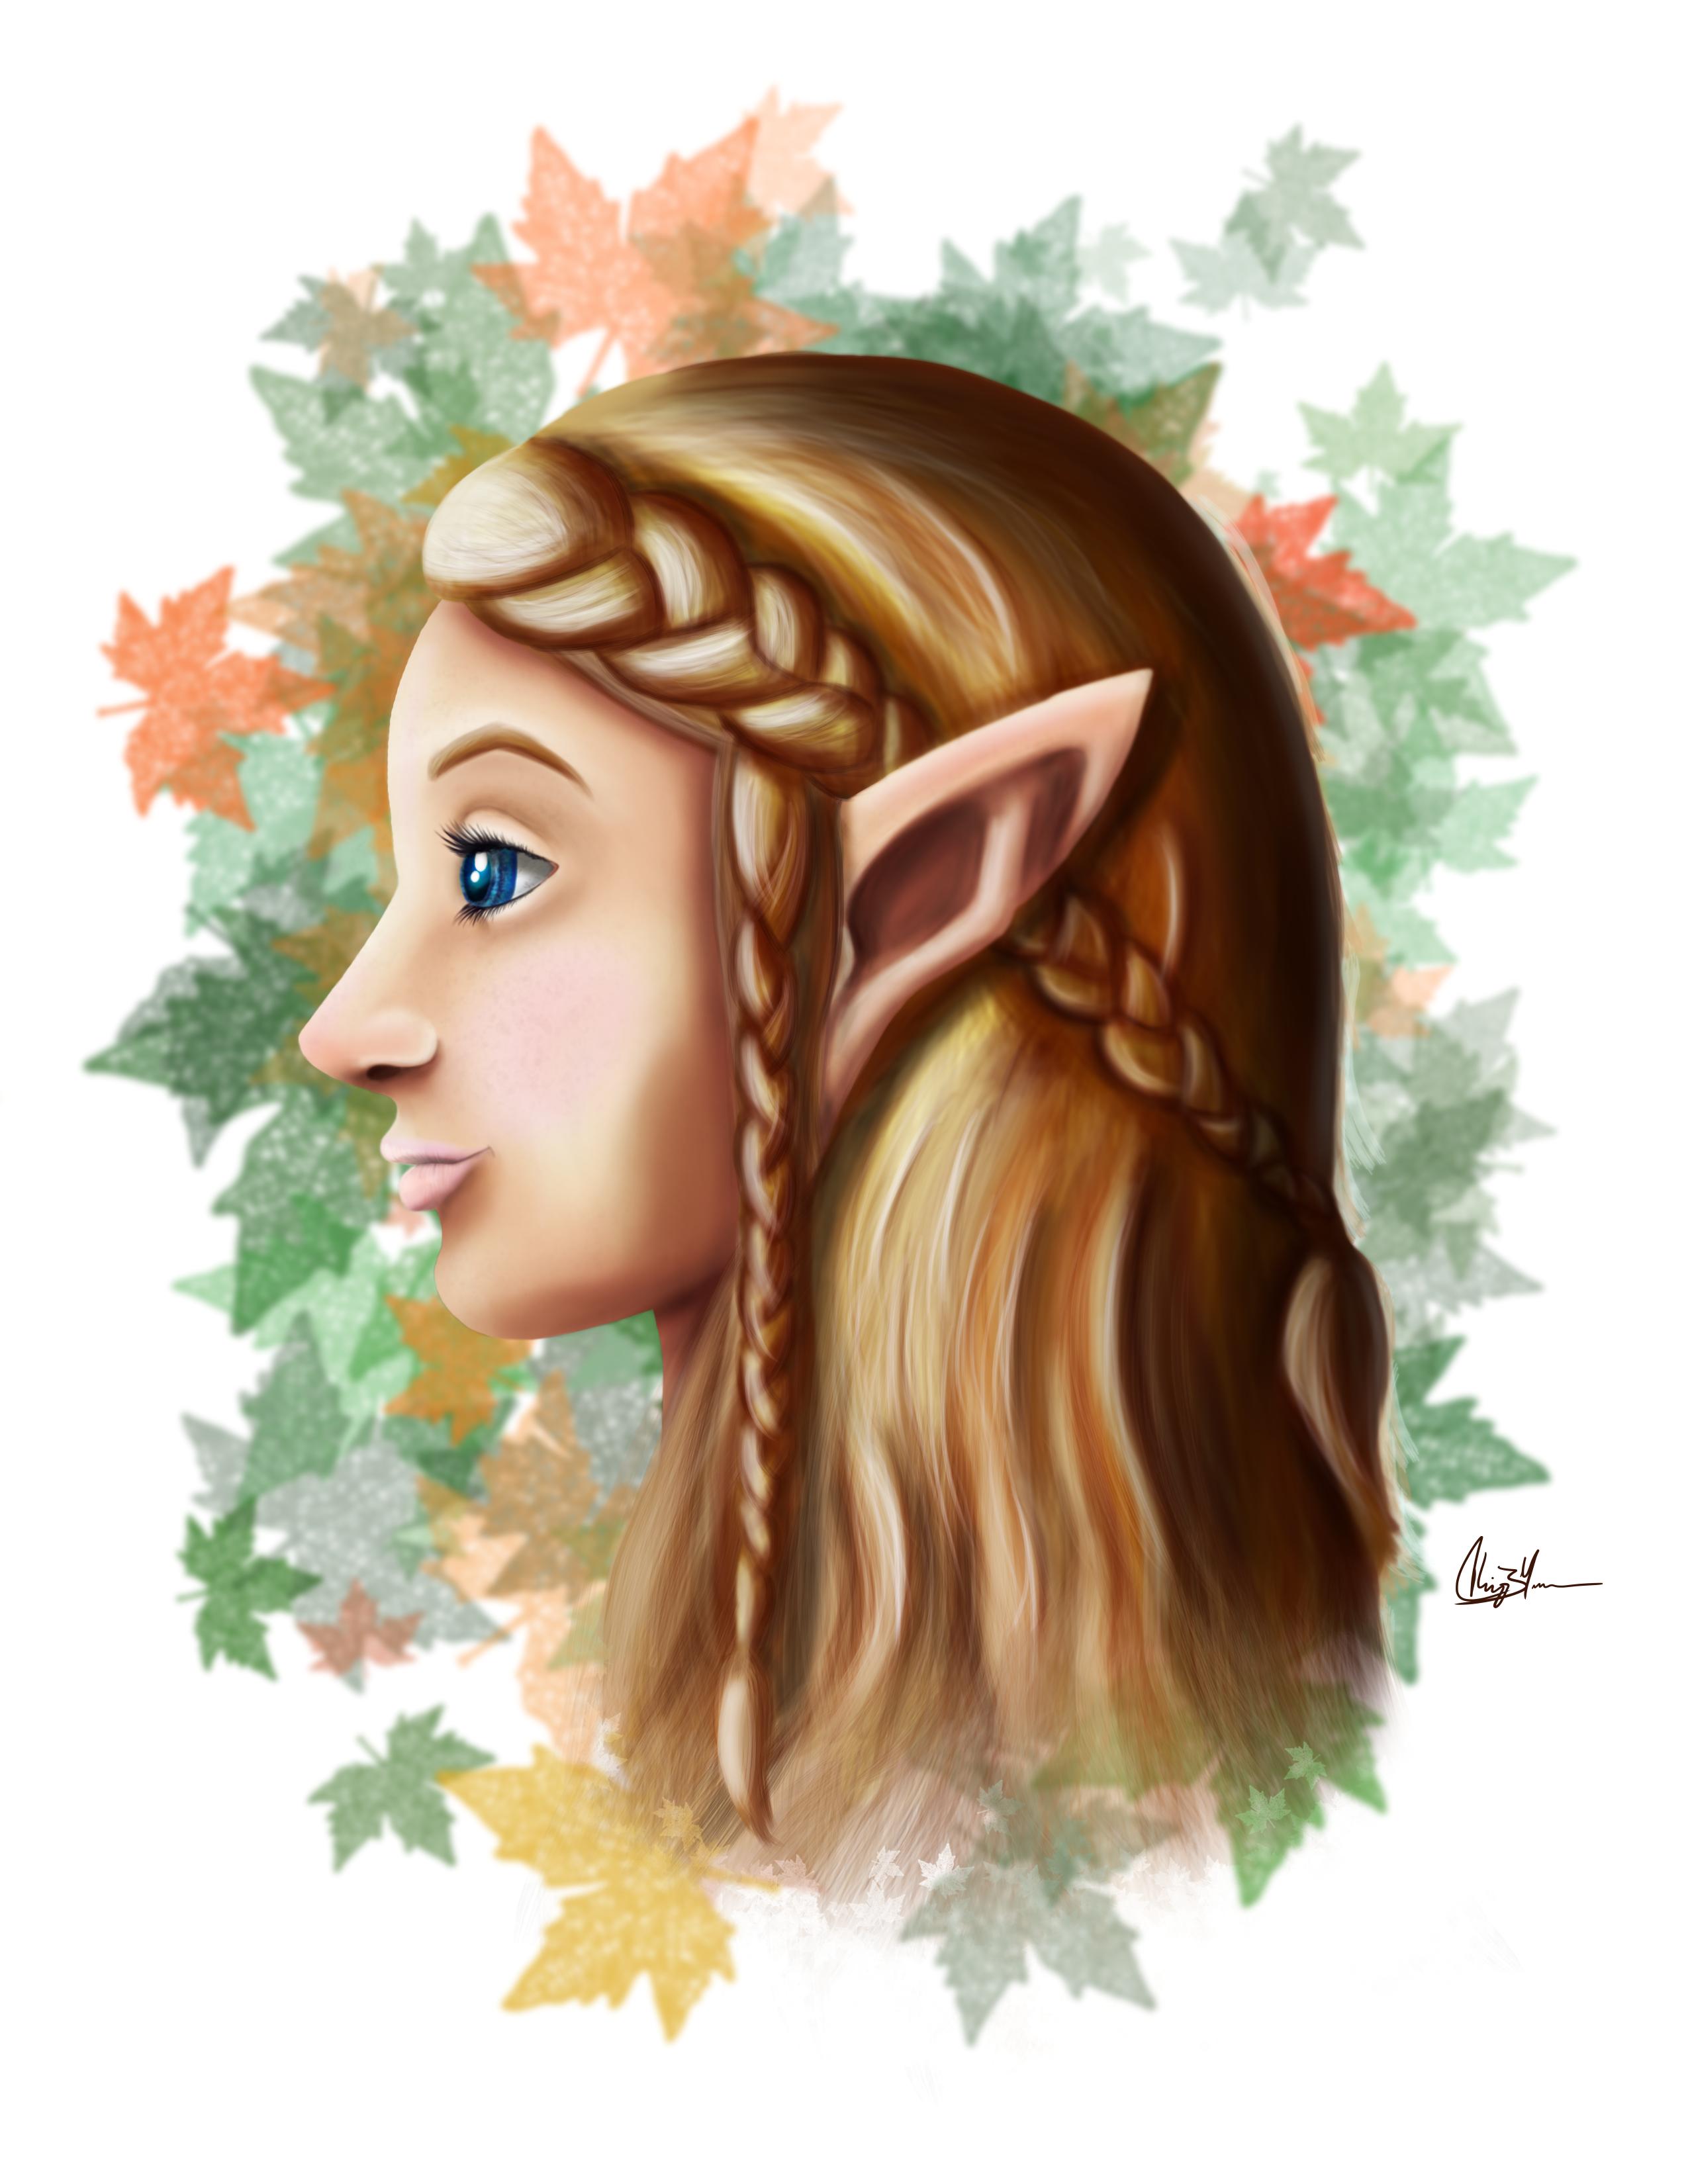 Portrait 2 - Elf